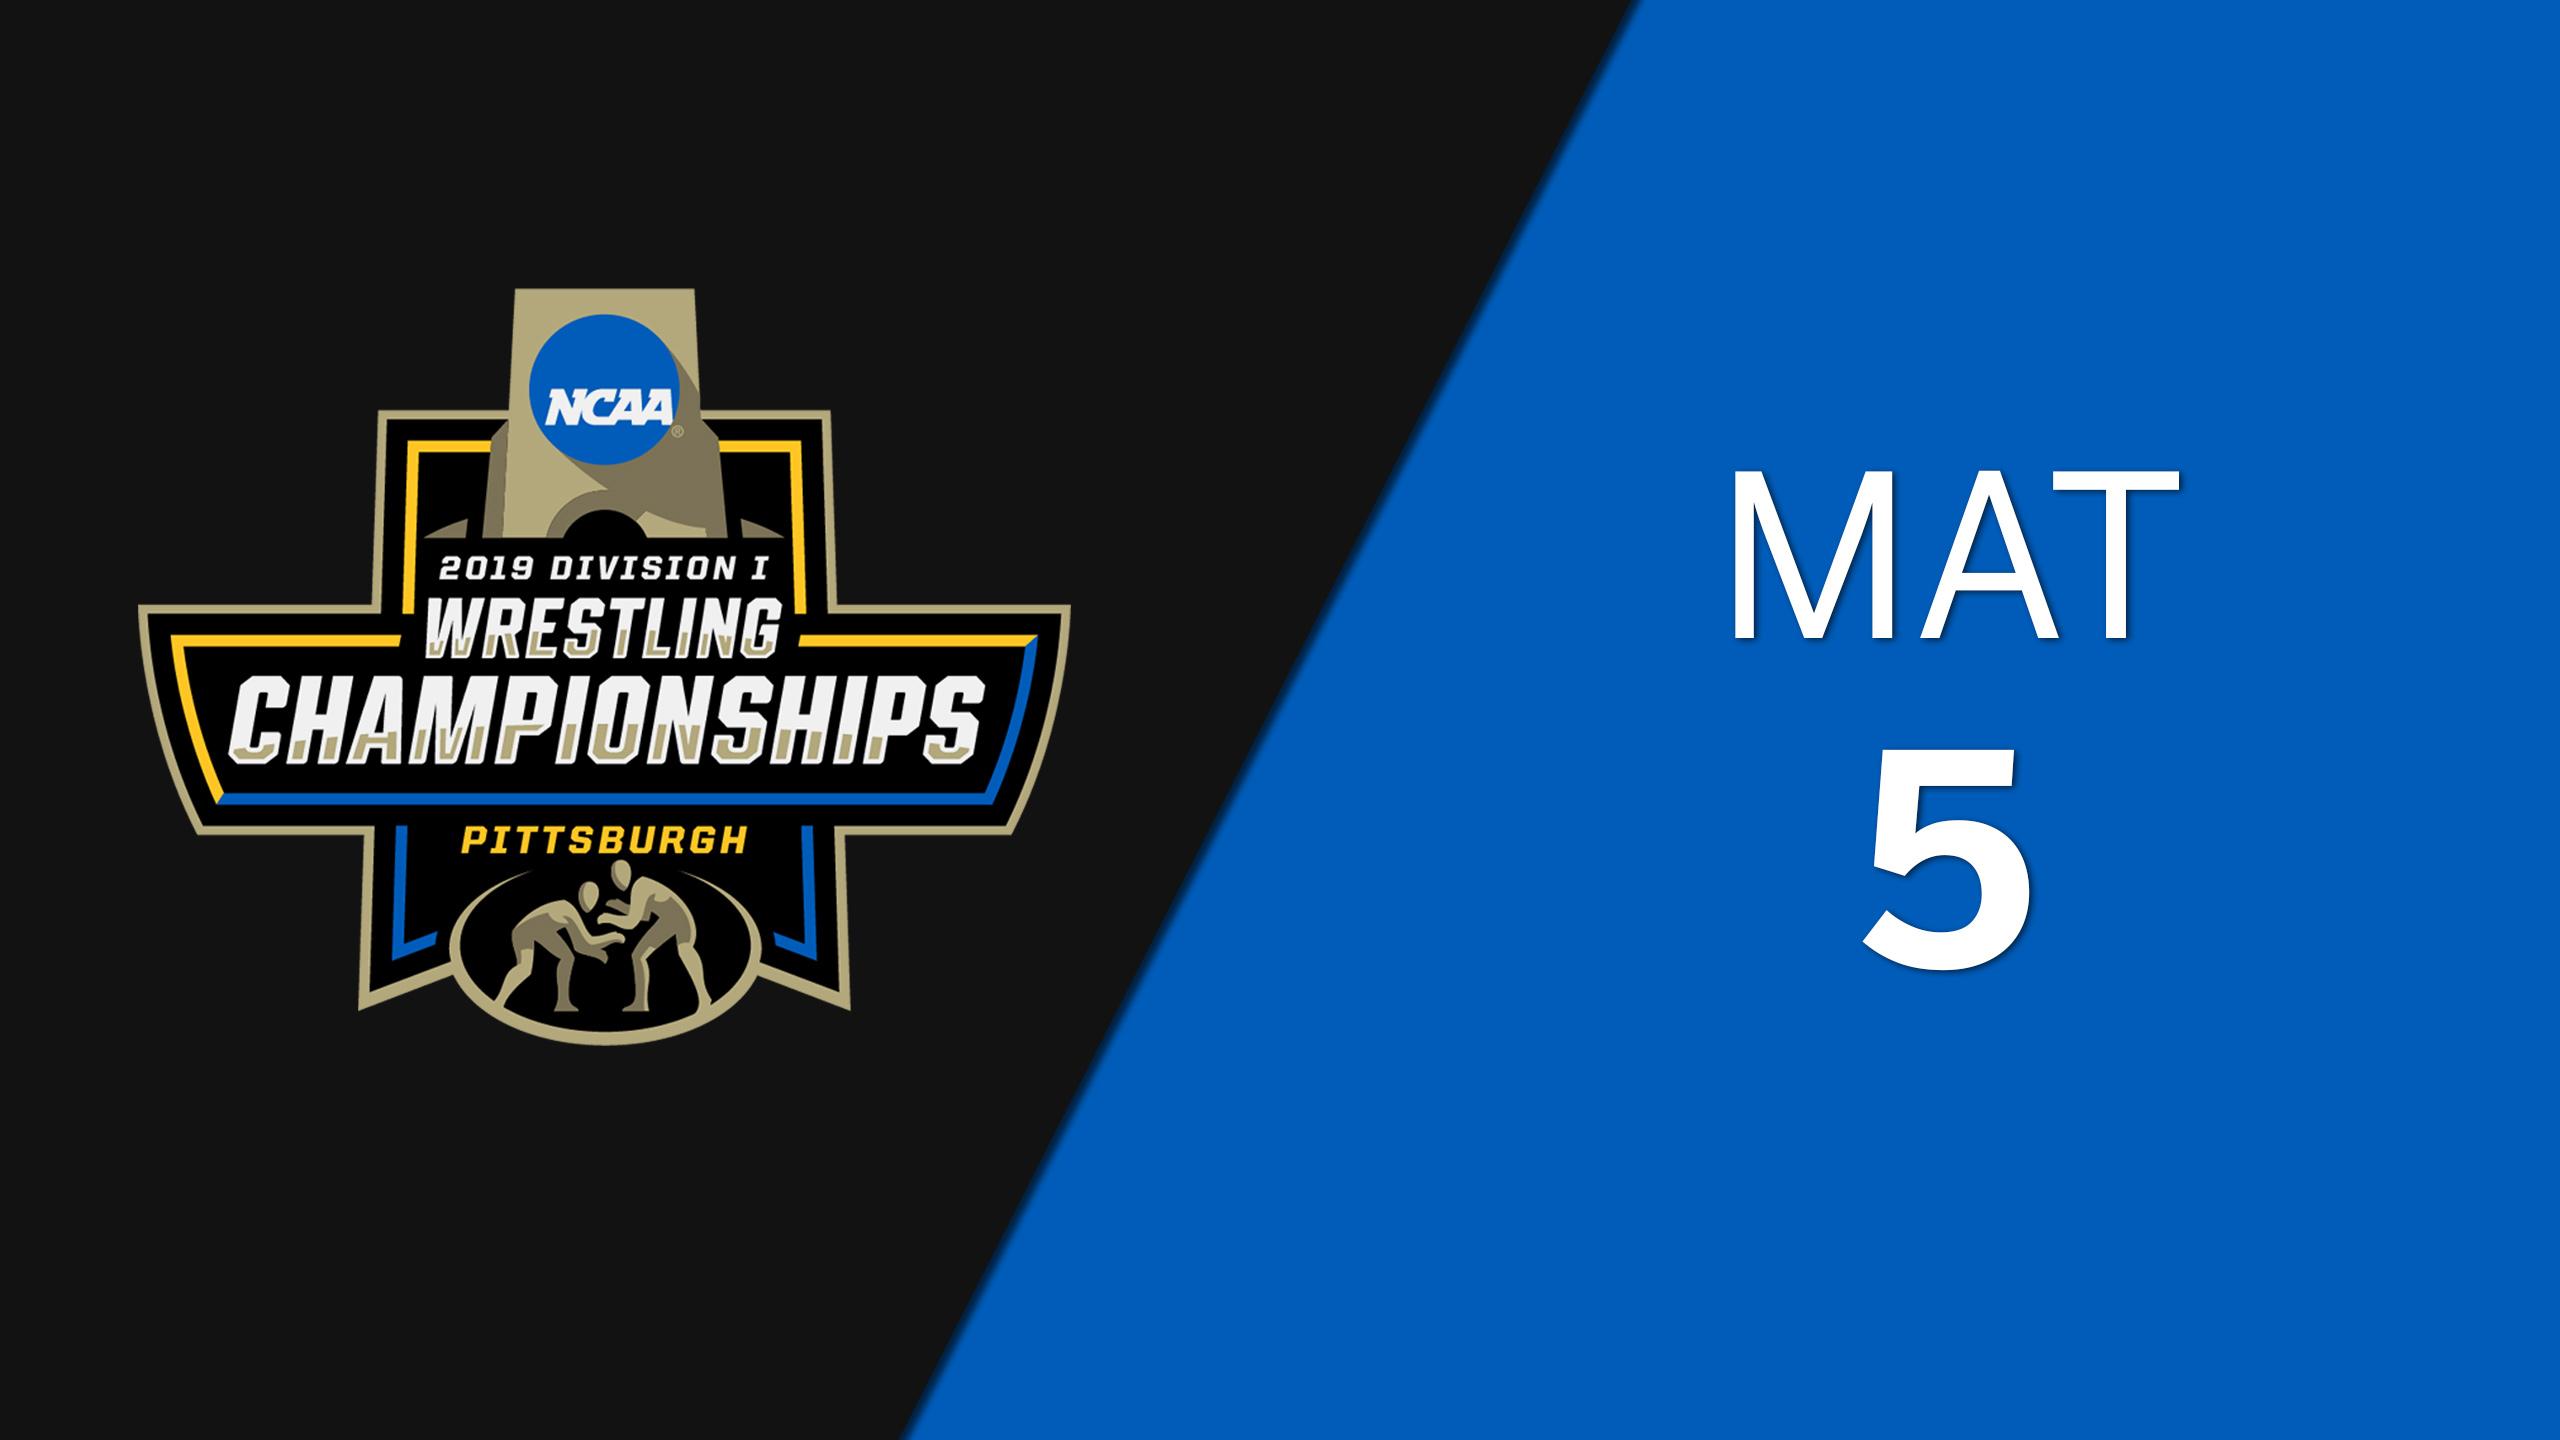 NCAA Wrestling Championship (Mat 5, Quarterfinals)